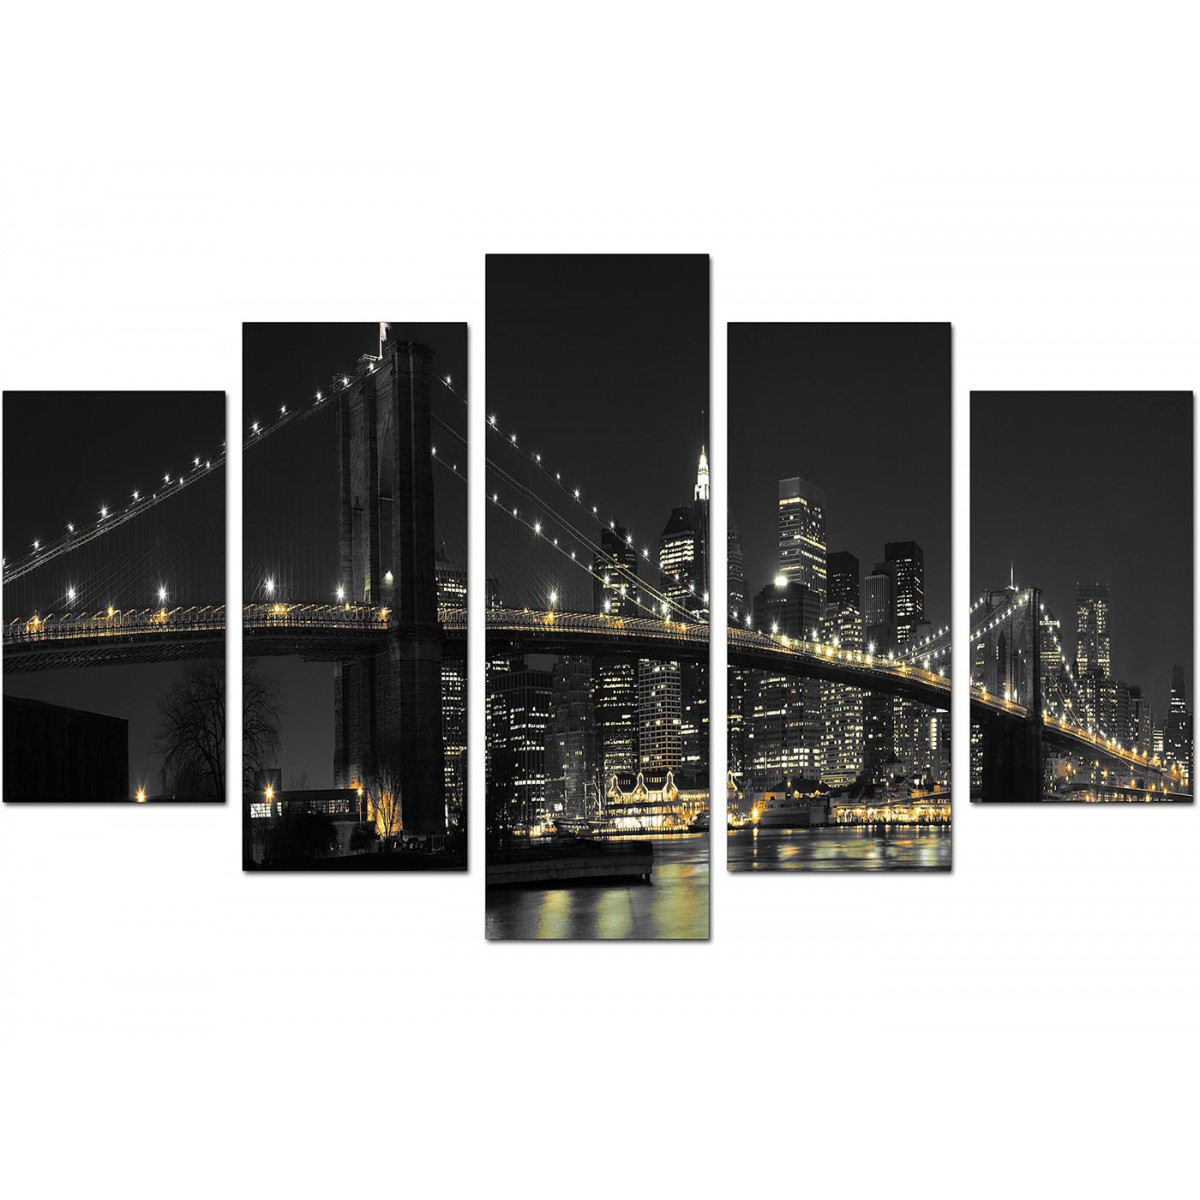 New York Nyc Skyline City Single Canvas Wall Art Picture: New York Canvas Wall Art For Your Living Room